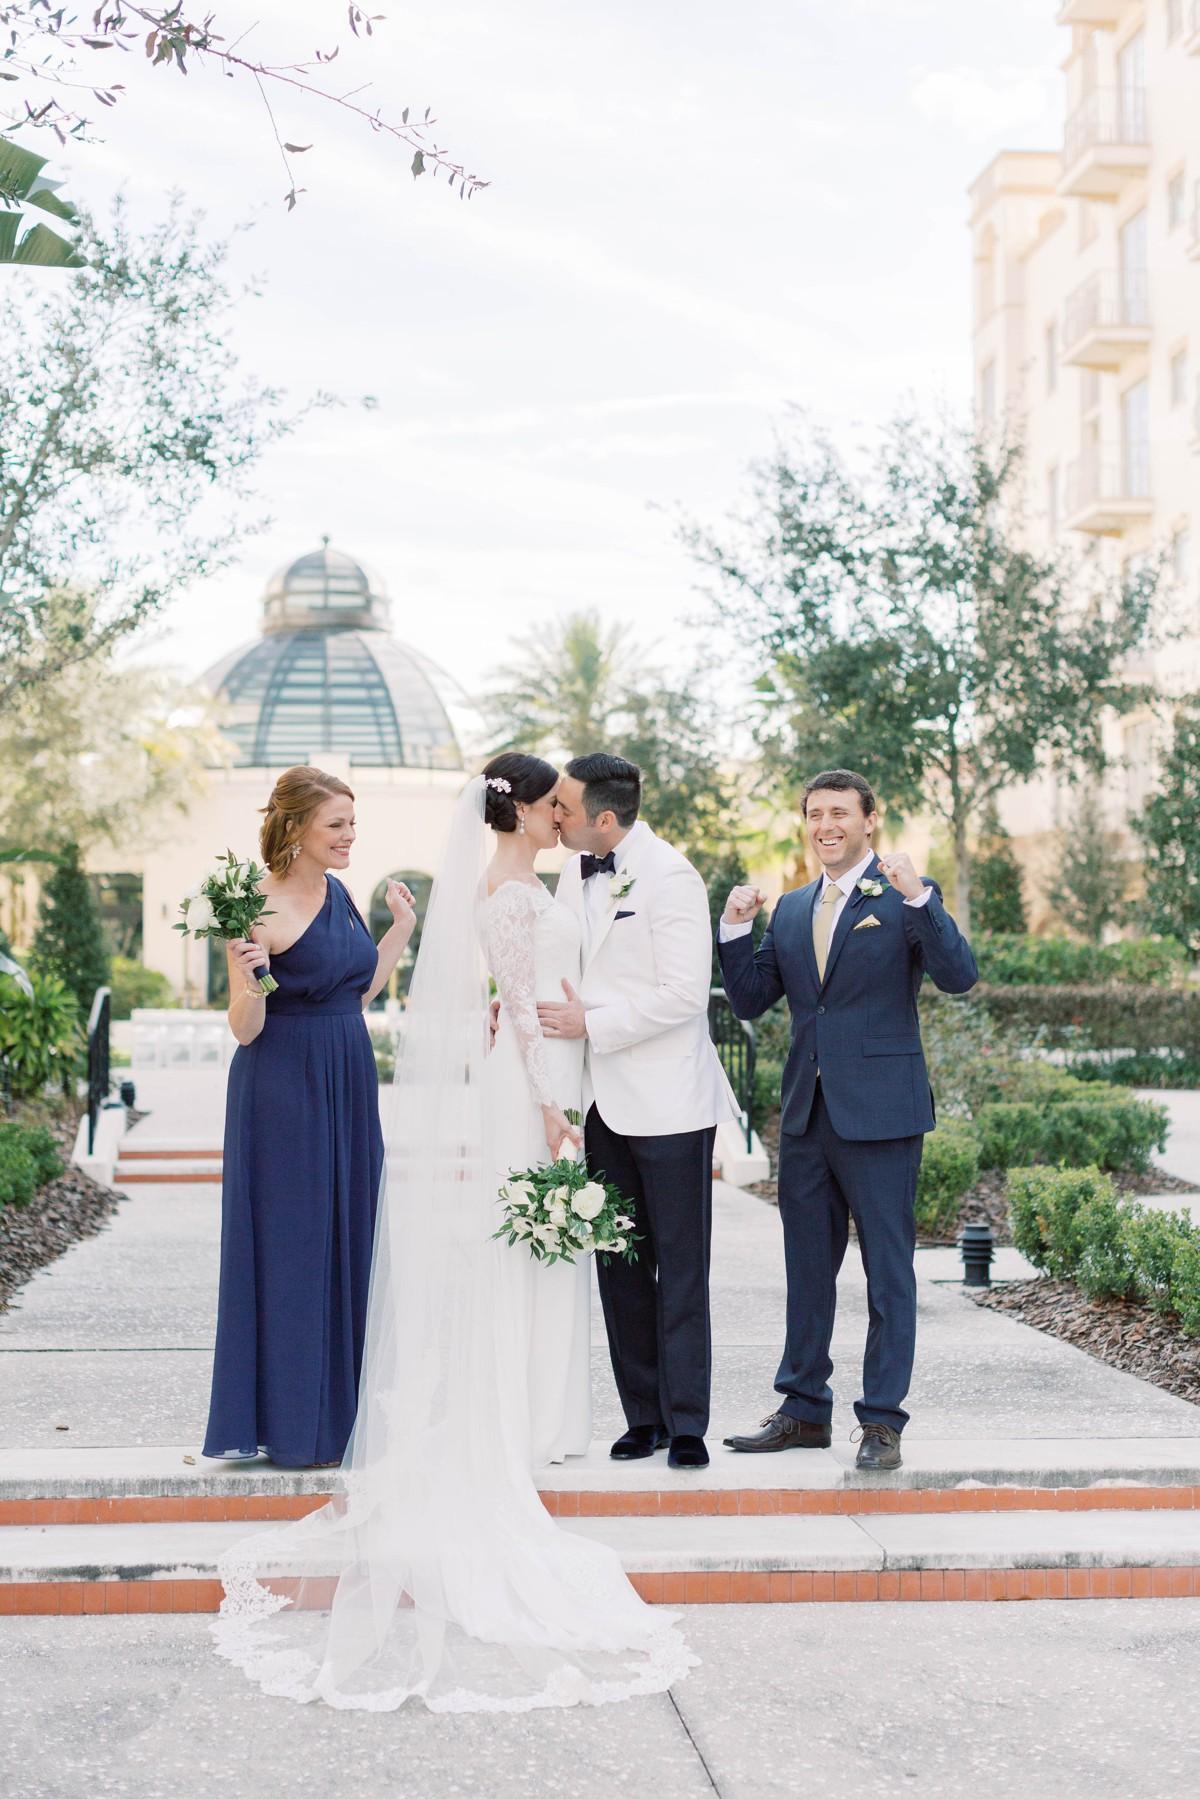 Alfond-Inn-Wedding-Winter-Park-Wedding-Photographer-Chantell-Rae-Photography_0033.jpg